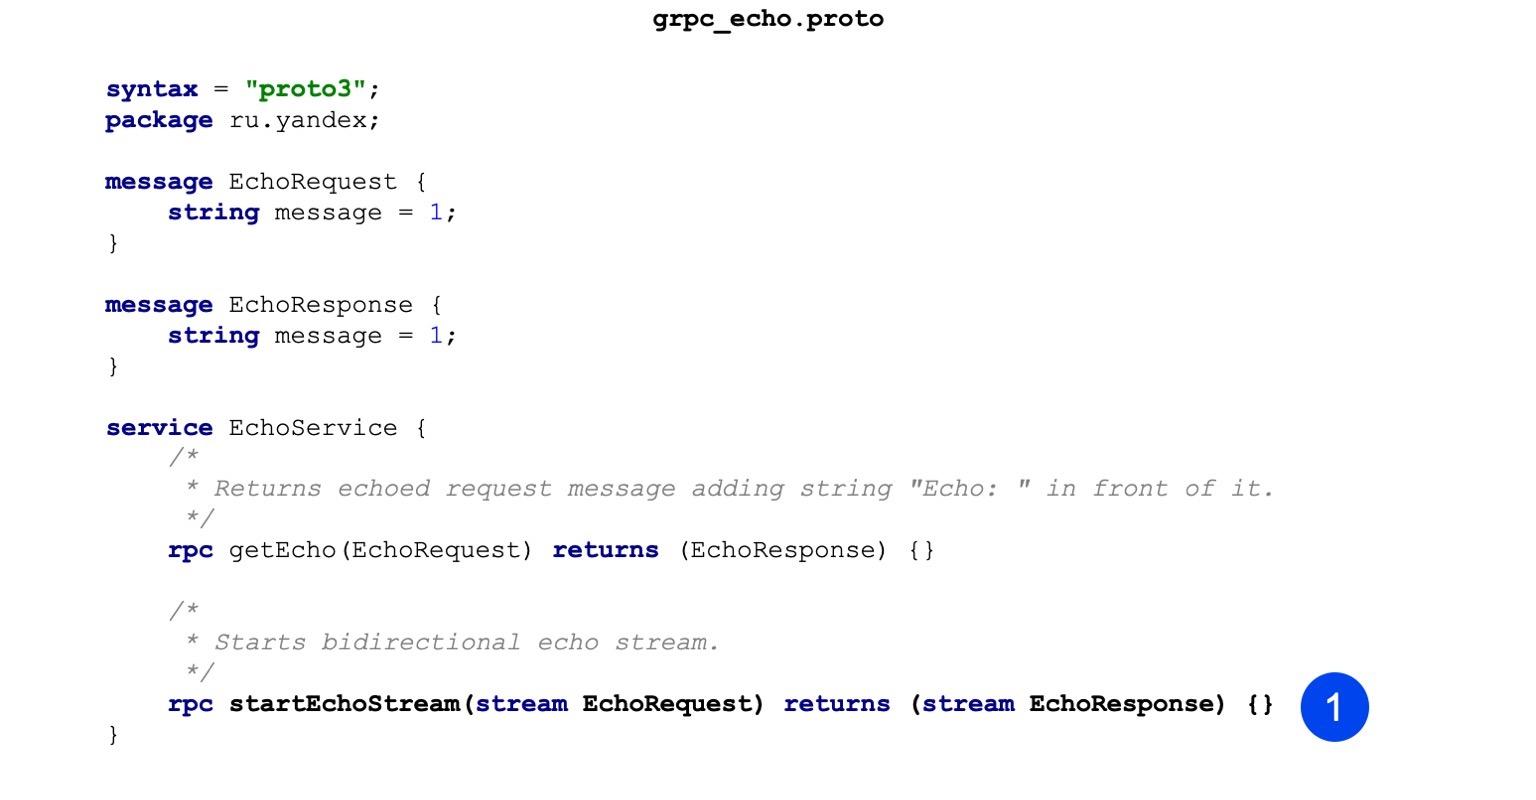 gRPC в качестве протокола межсервисного взаимодействия. Доклад Яндекса - 18